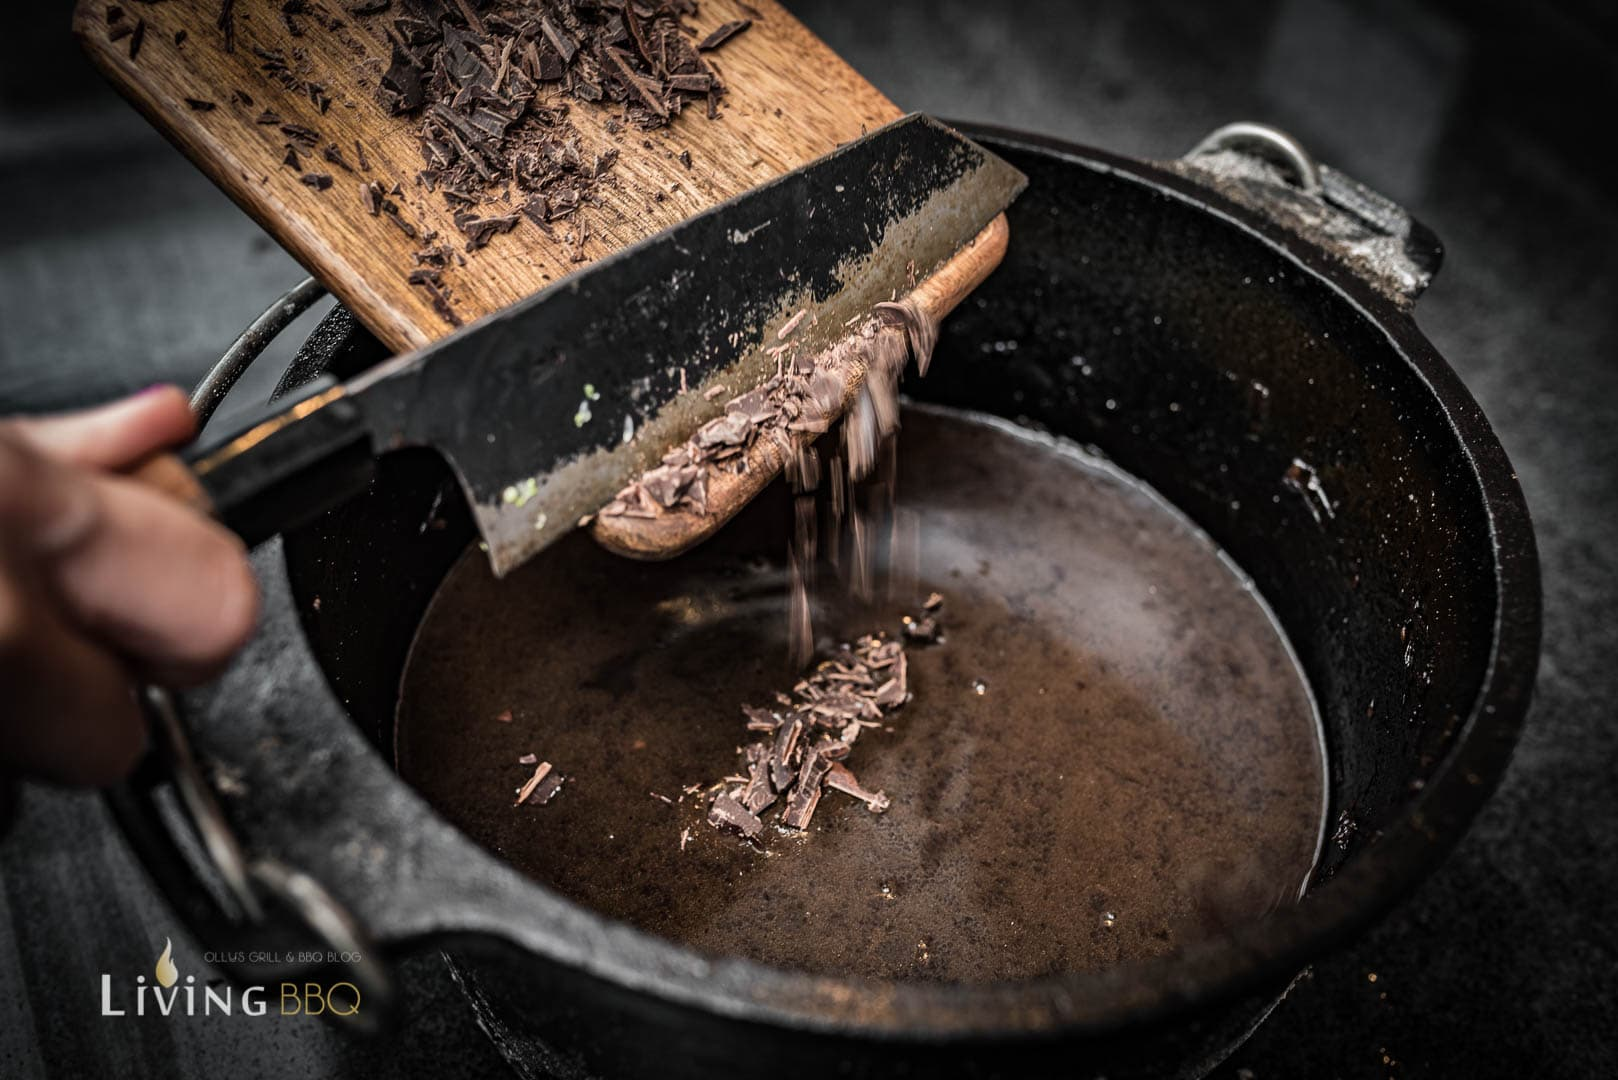 Schokolade in Rotweinsauce